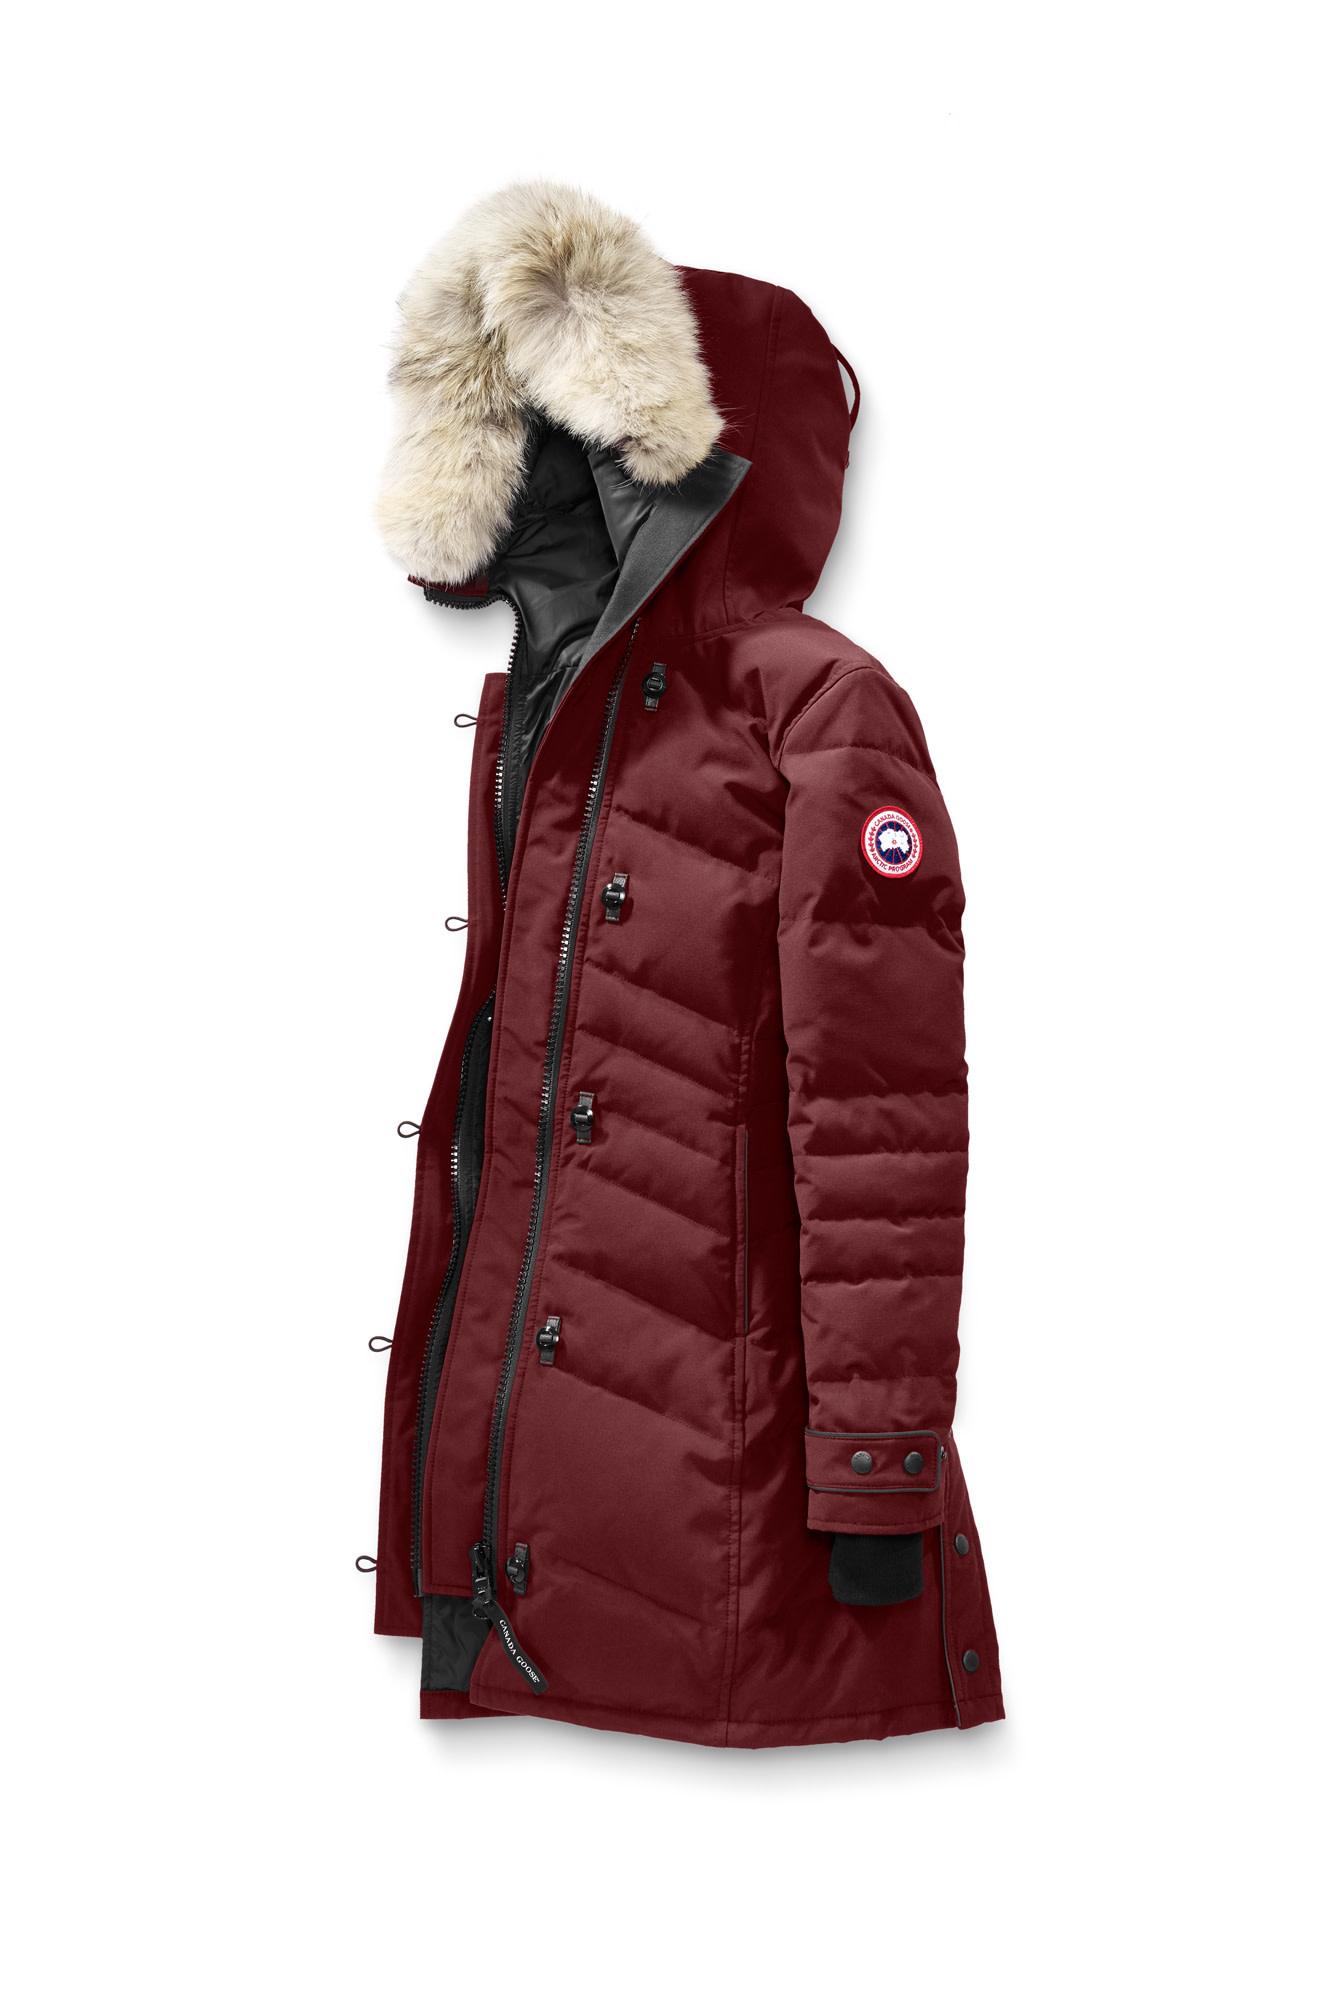 Canada Goose Canada Goose Women's Lorette Parka